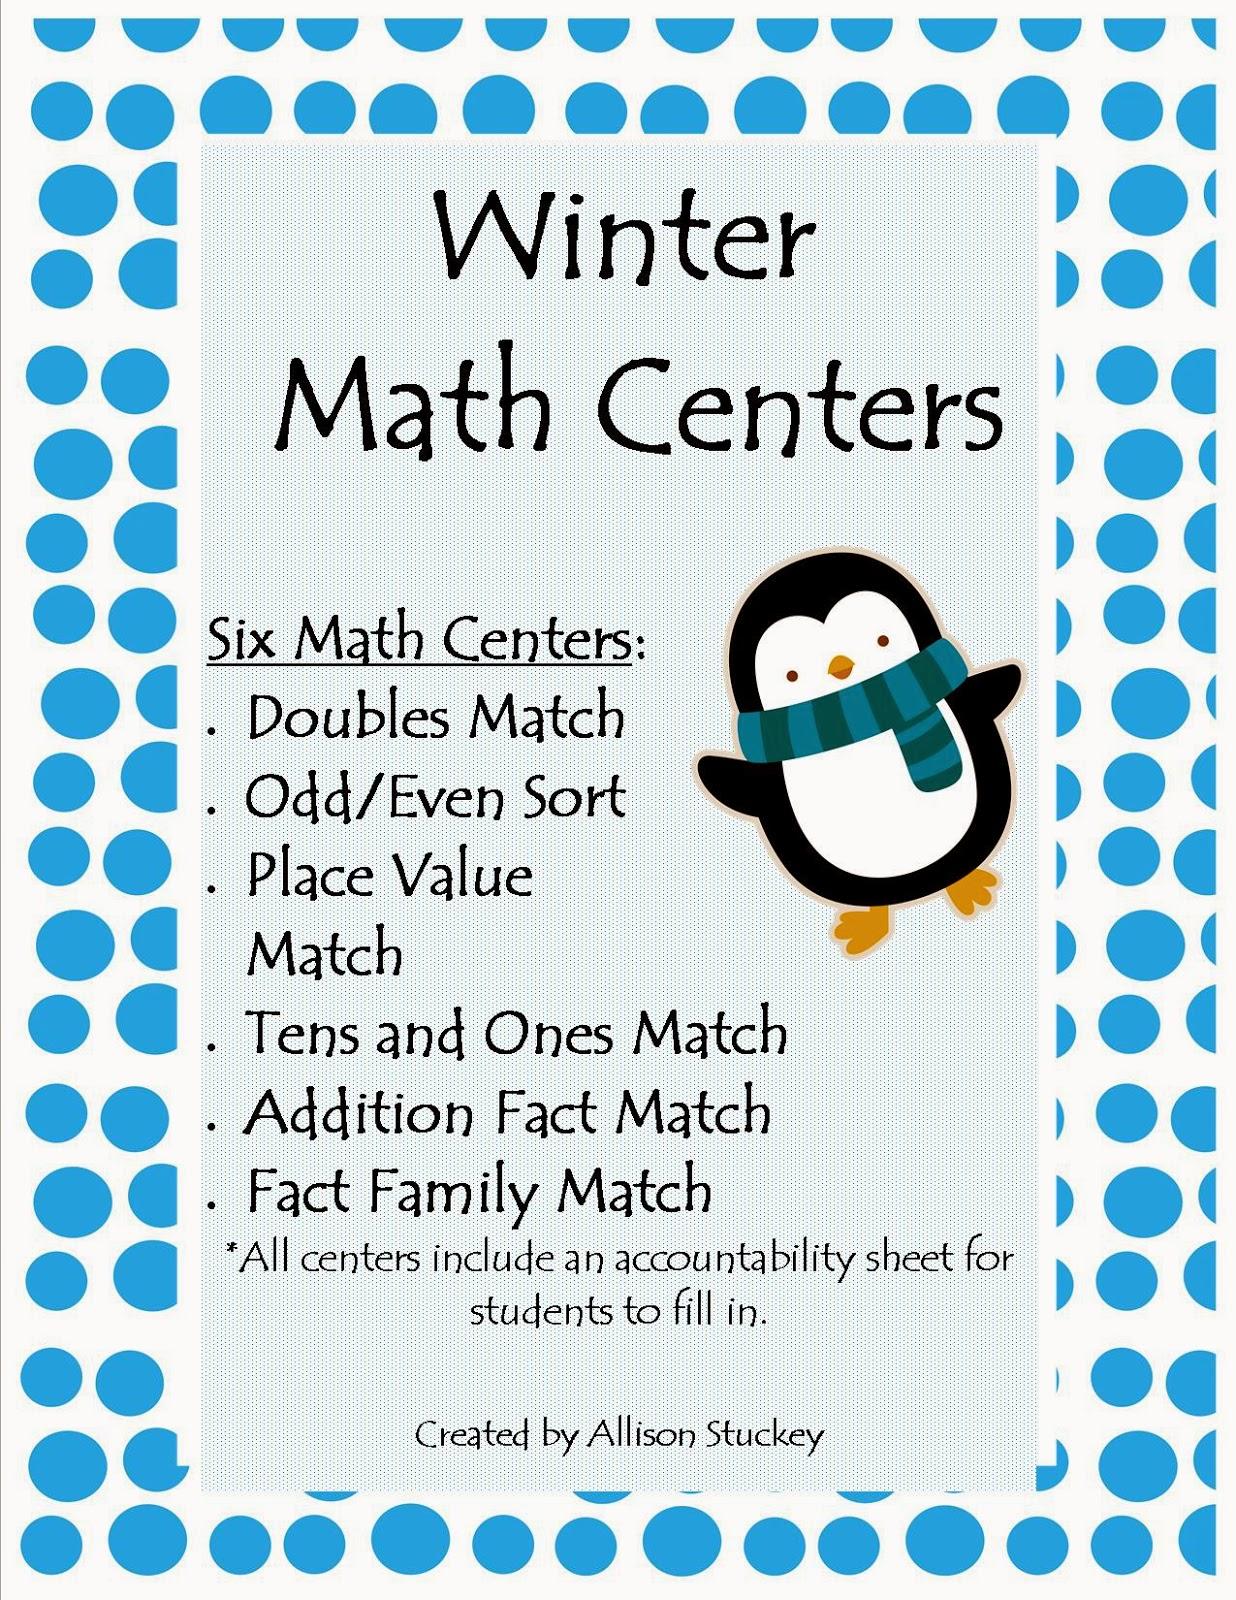 http://www.teacherspayteachers.com/Product/Winter-Math-Centers-for-1st-and-2nd-Graders-363498